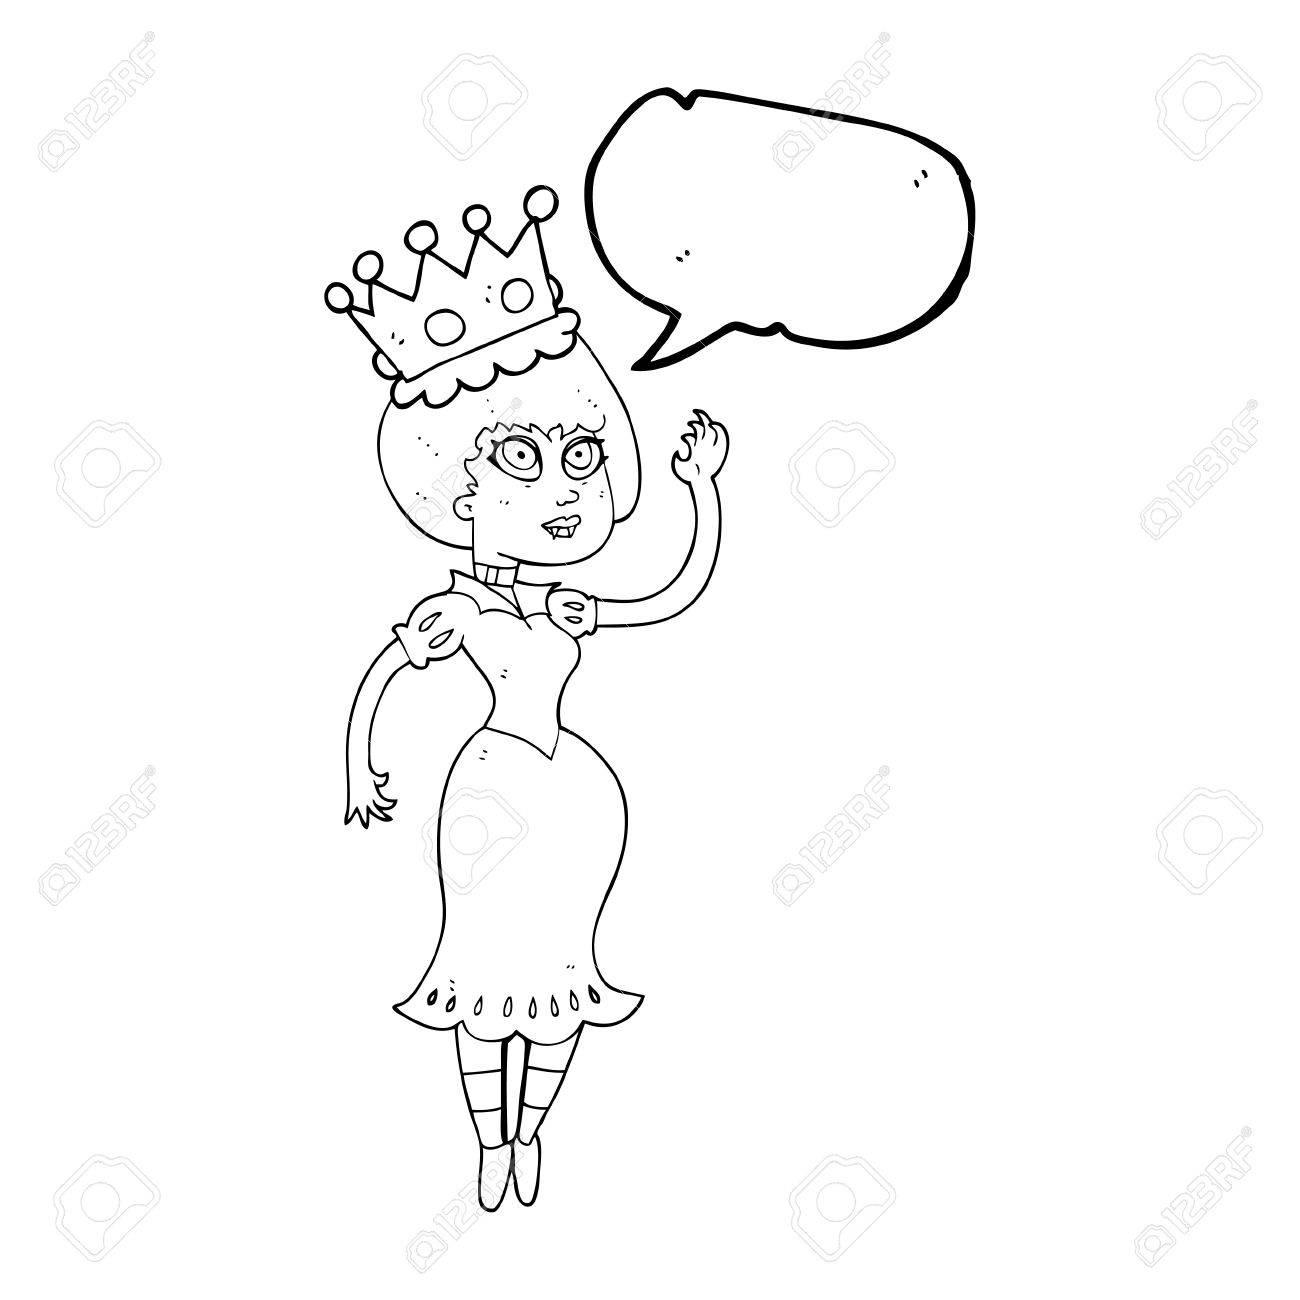 1300x1300 Freehand Drawn Speech Bubble Cartoon Vampire Queen Waving Royalty